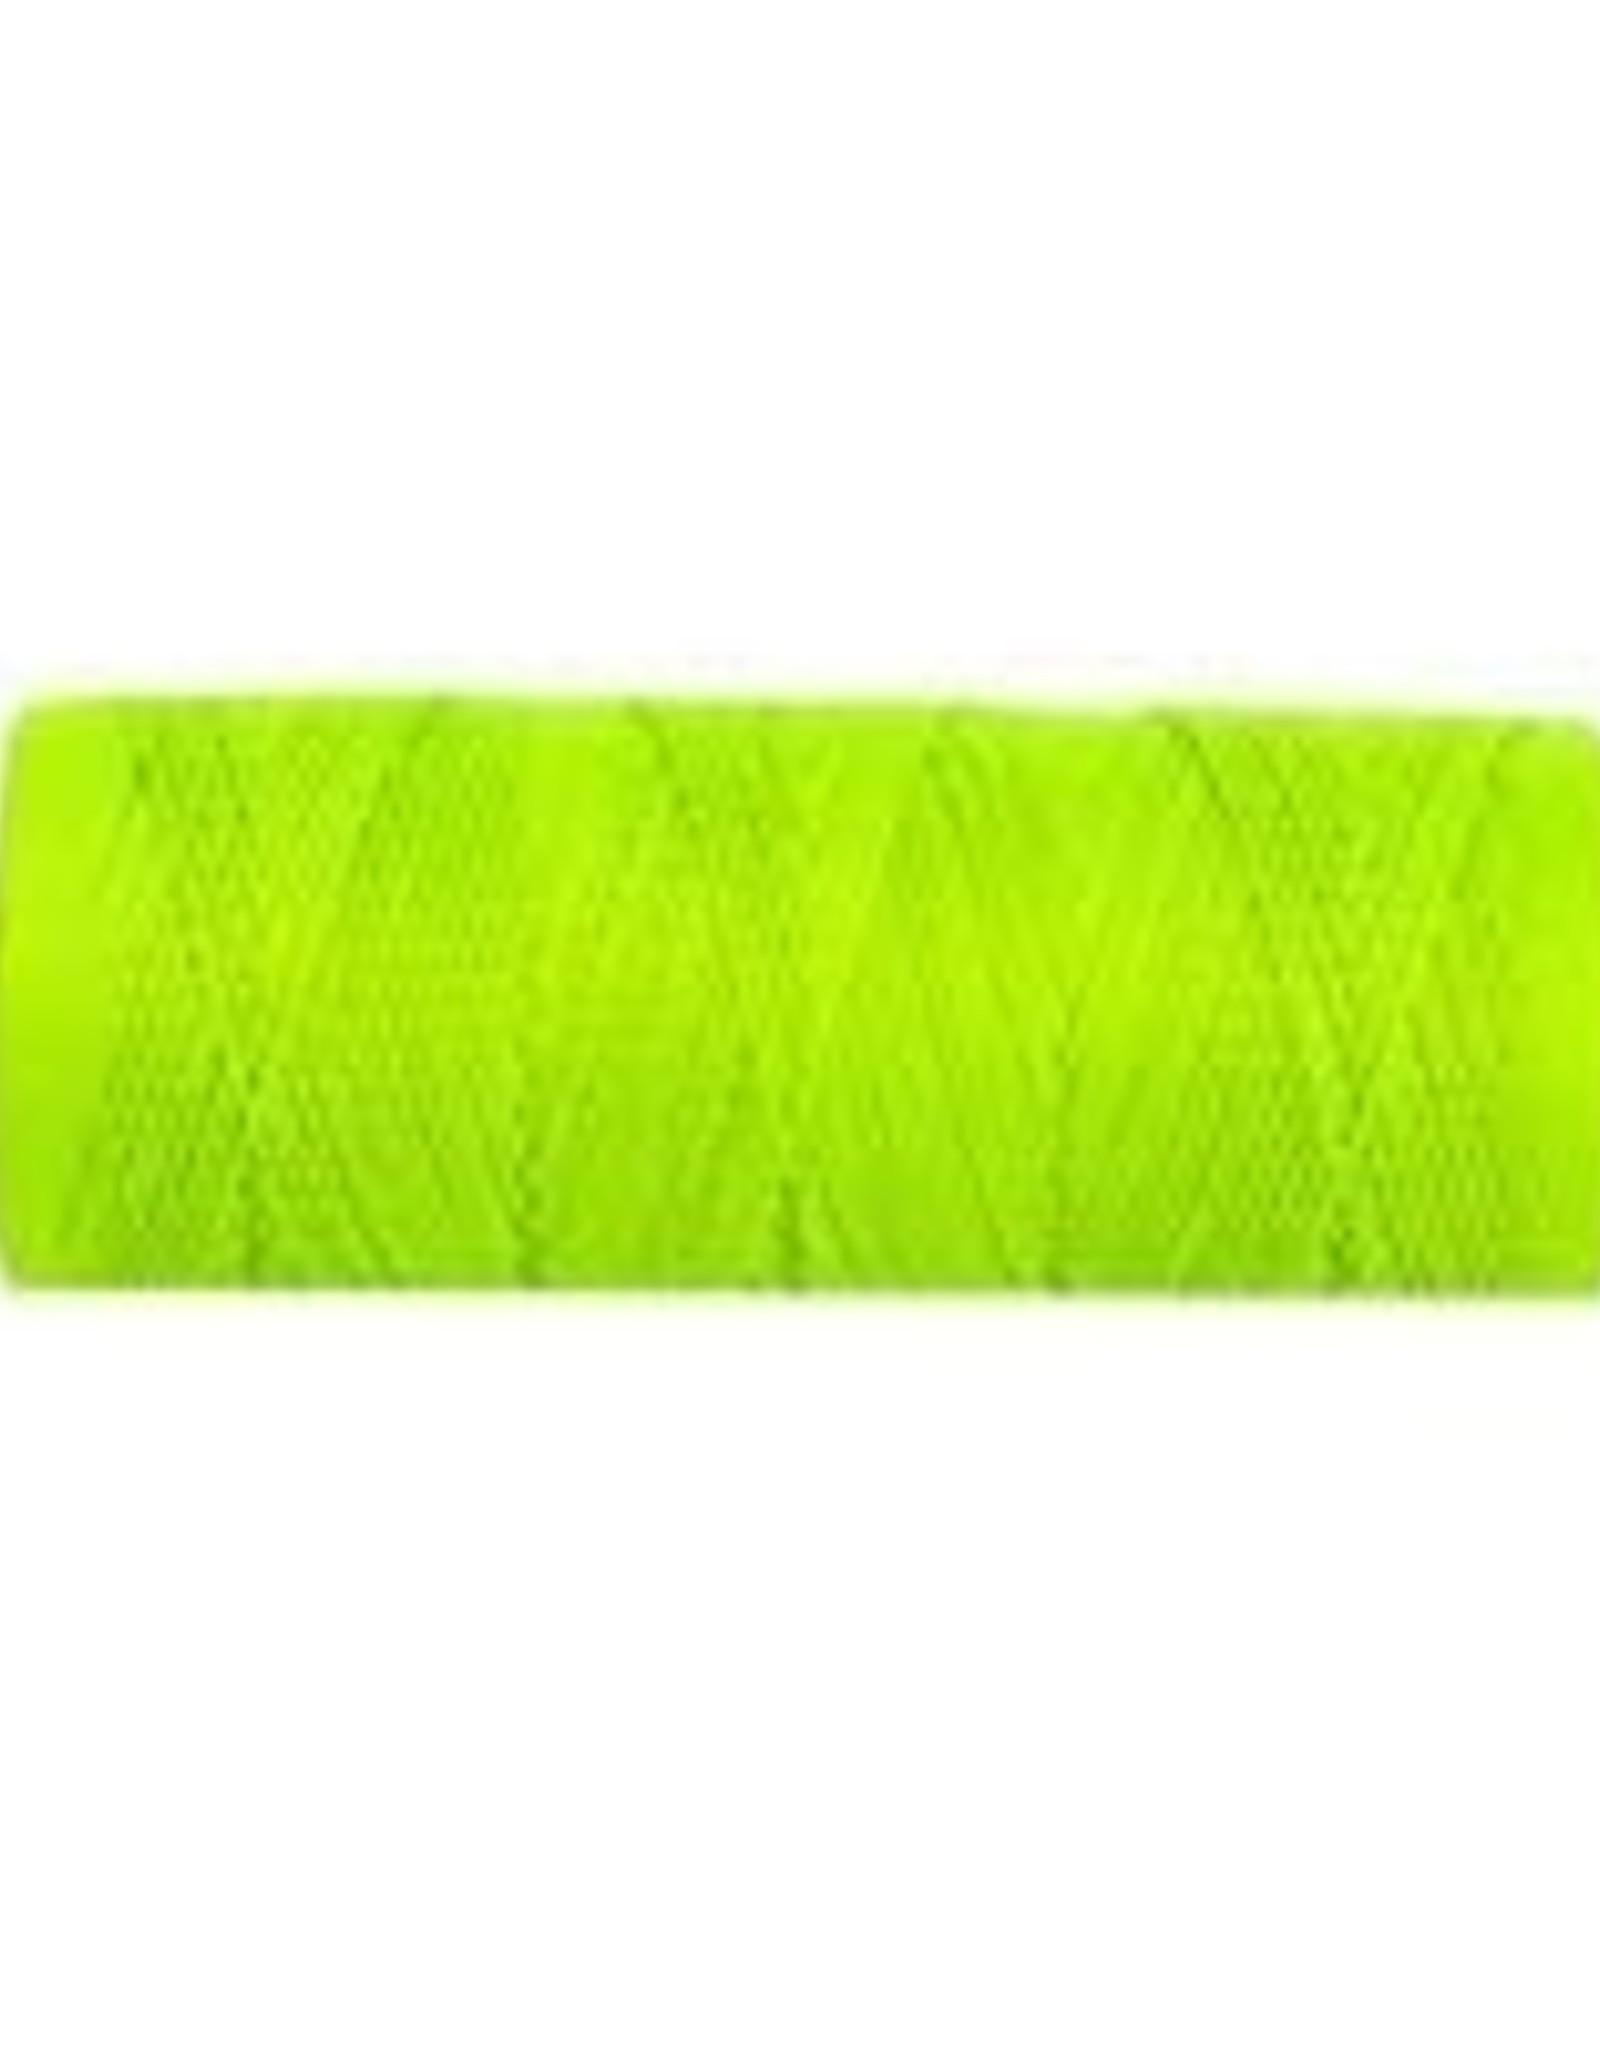 MJJ Brands Supramax Twine 170 lb Test / #18 x 525' / 160 m - Lime